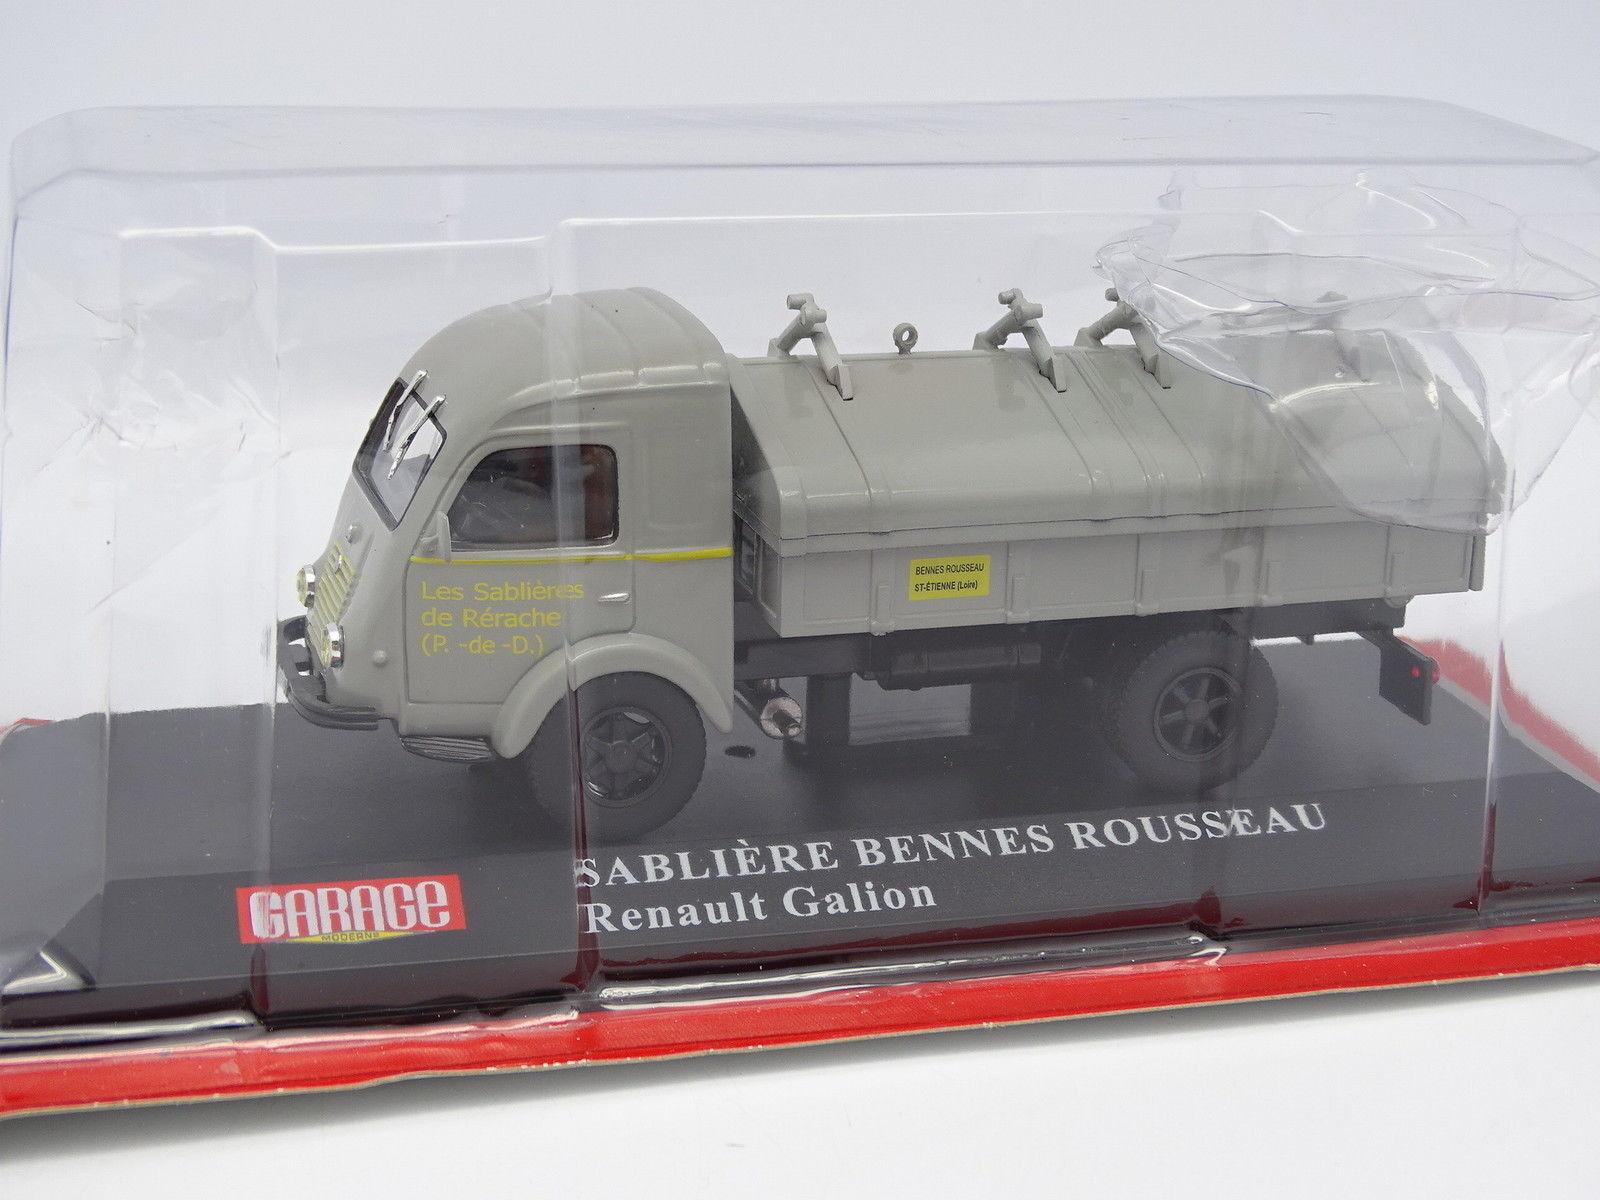 Ixo Presse Garage Moderne 1 43 - Renault Galion Sablières Bennes Rousseau